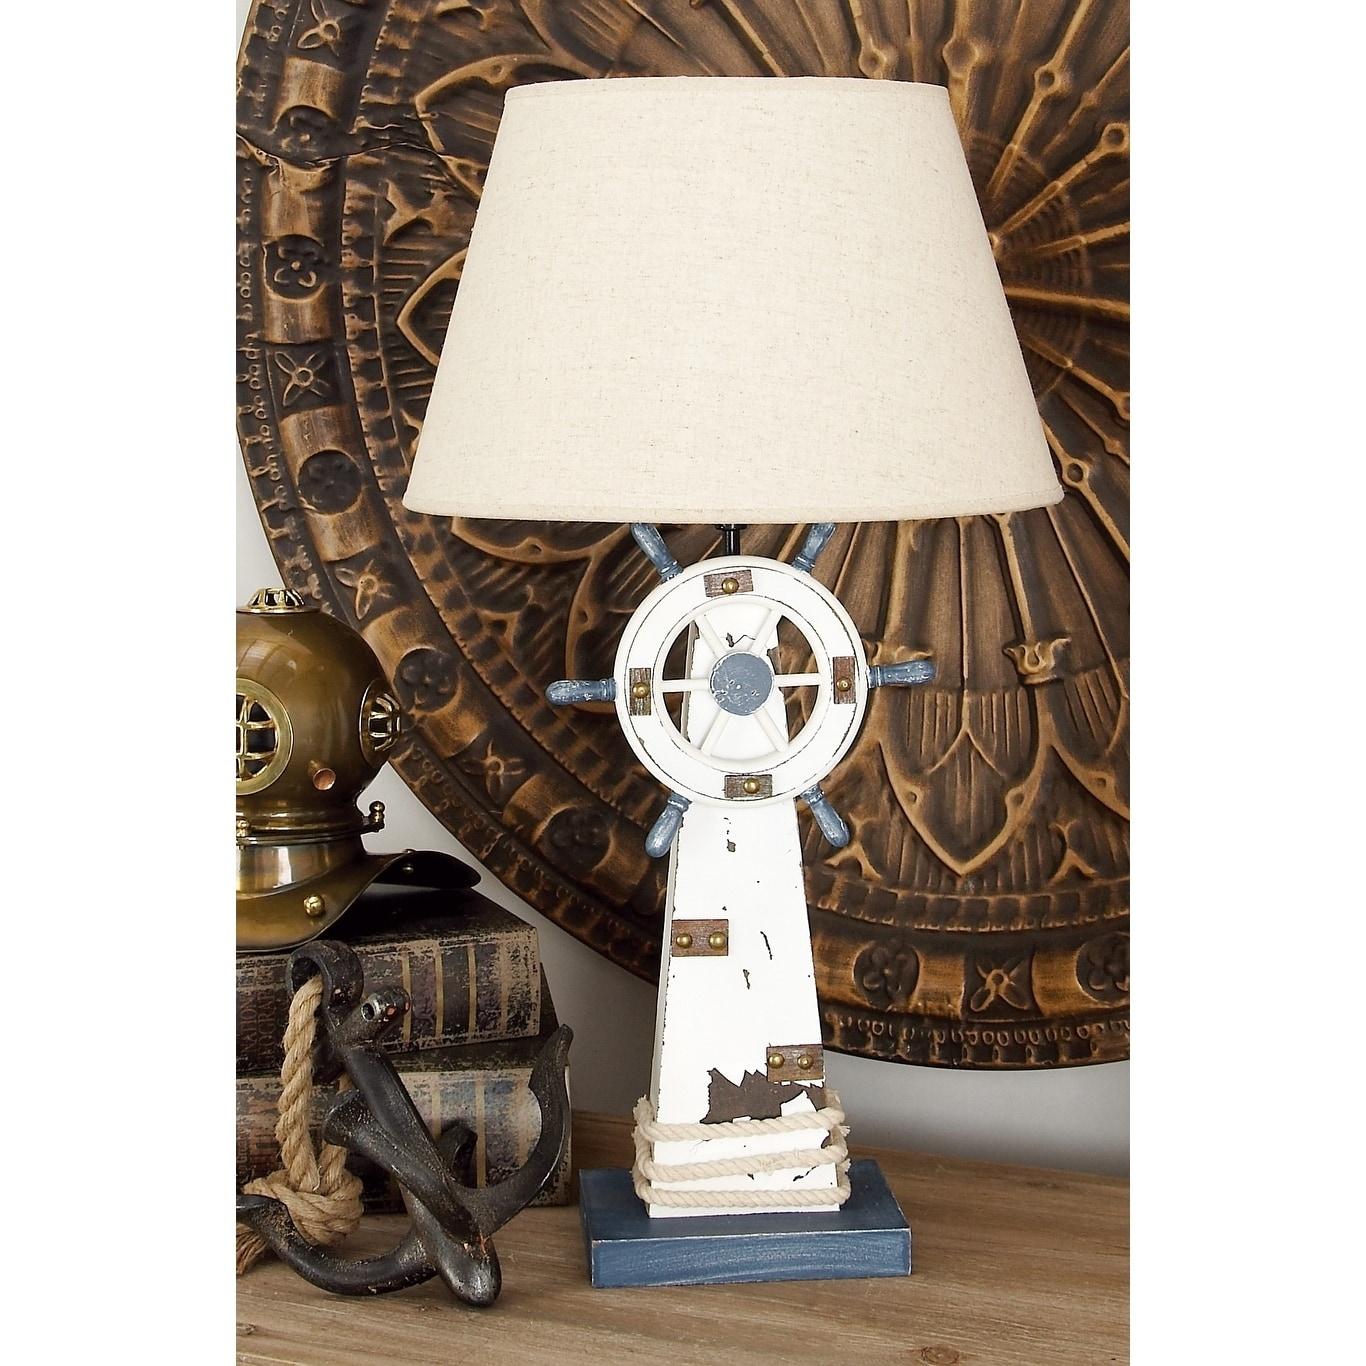 Studio 350 Wood Lighthouse Table Lamp (WD Lighthouse Tabl...